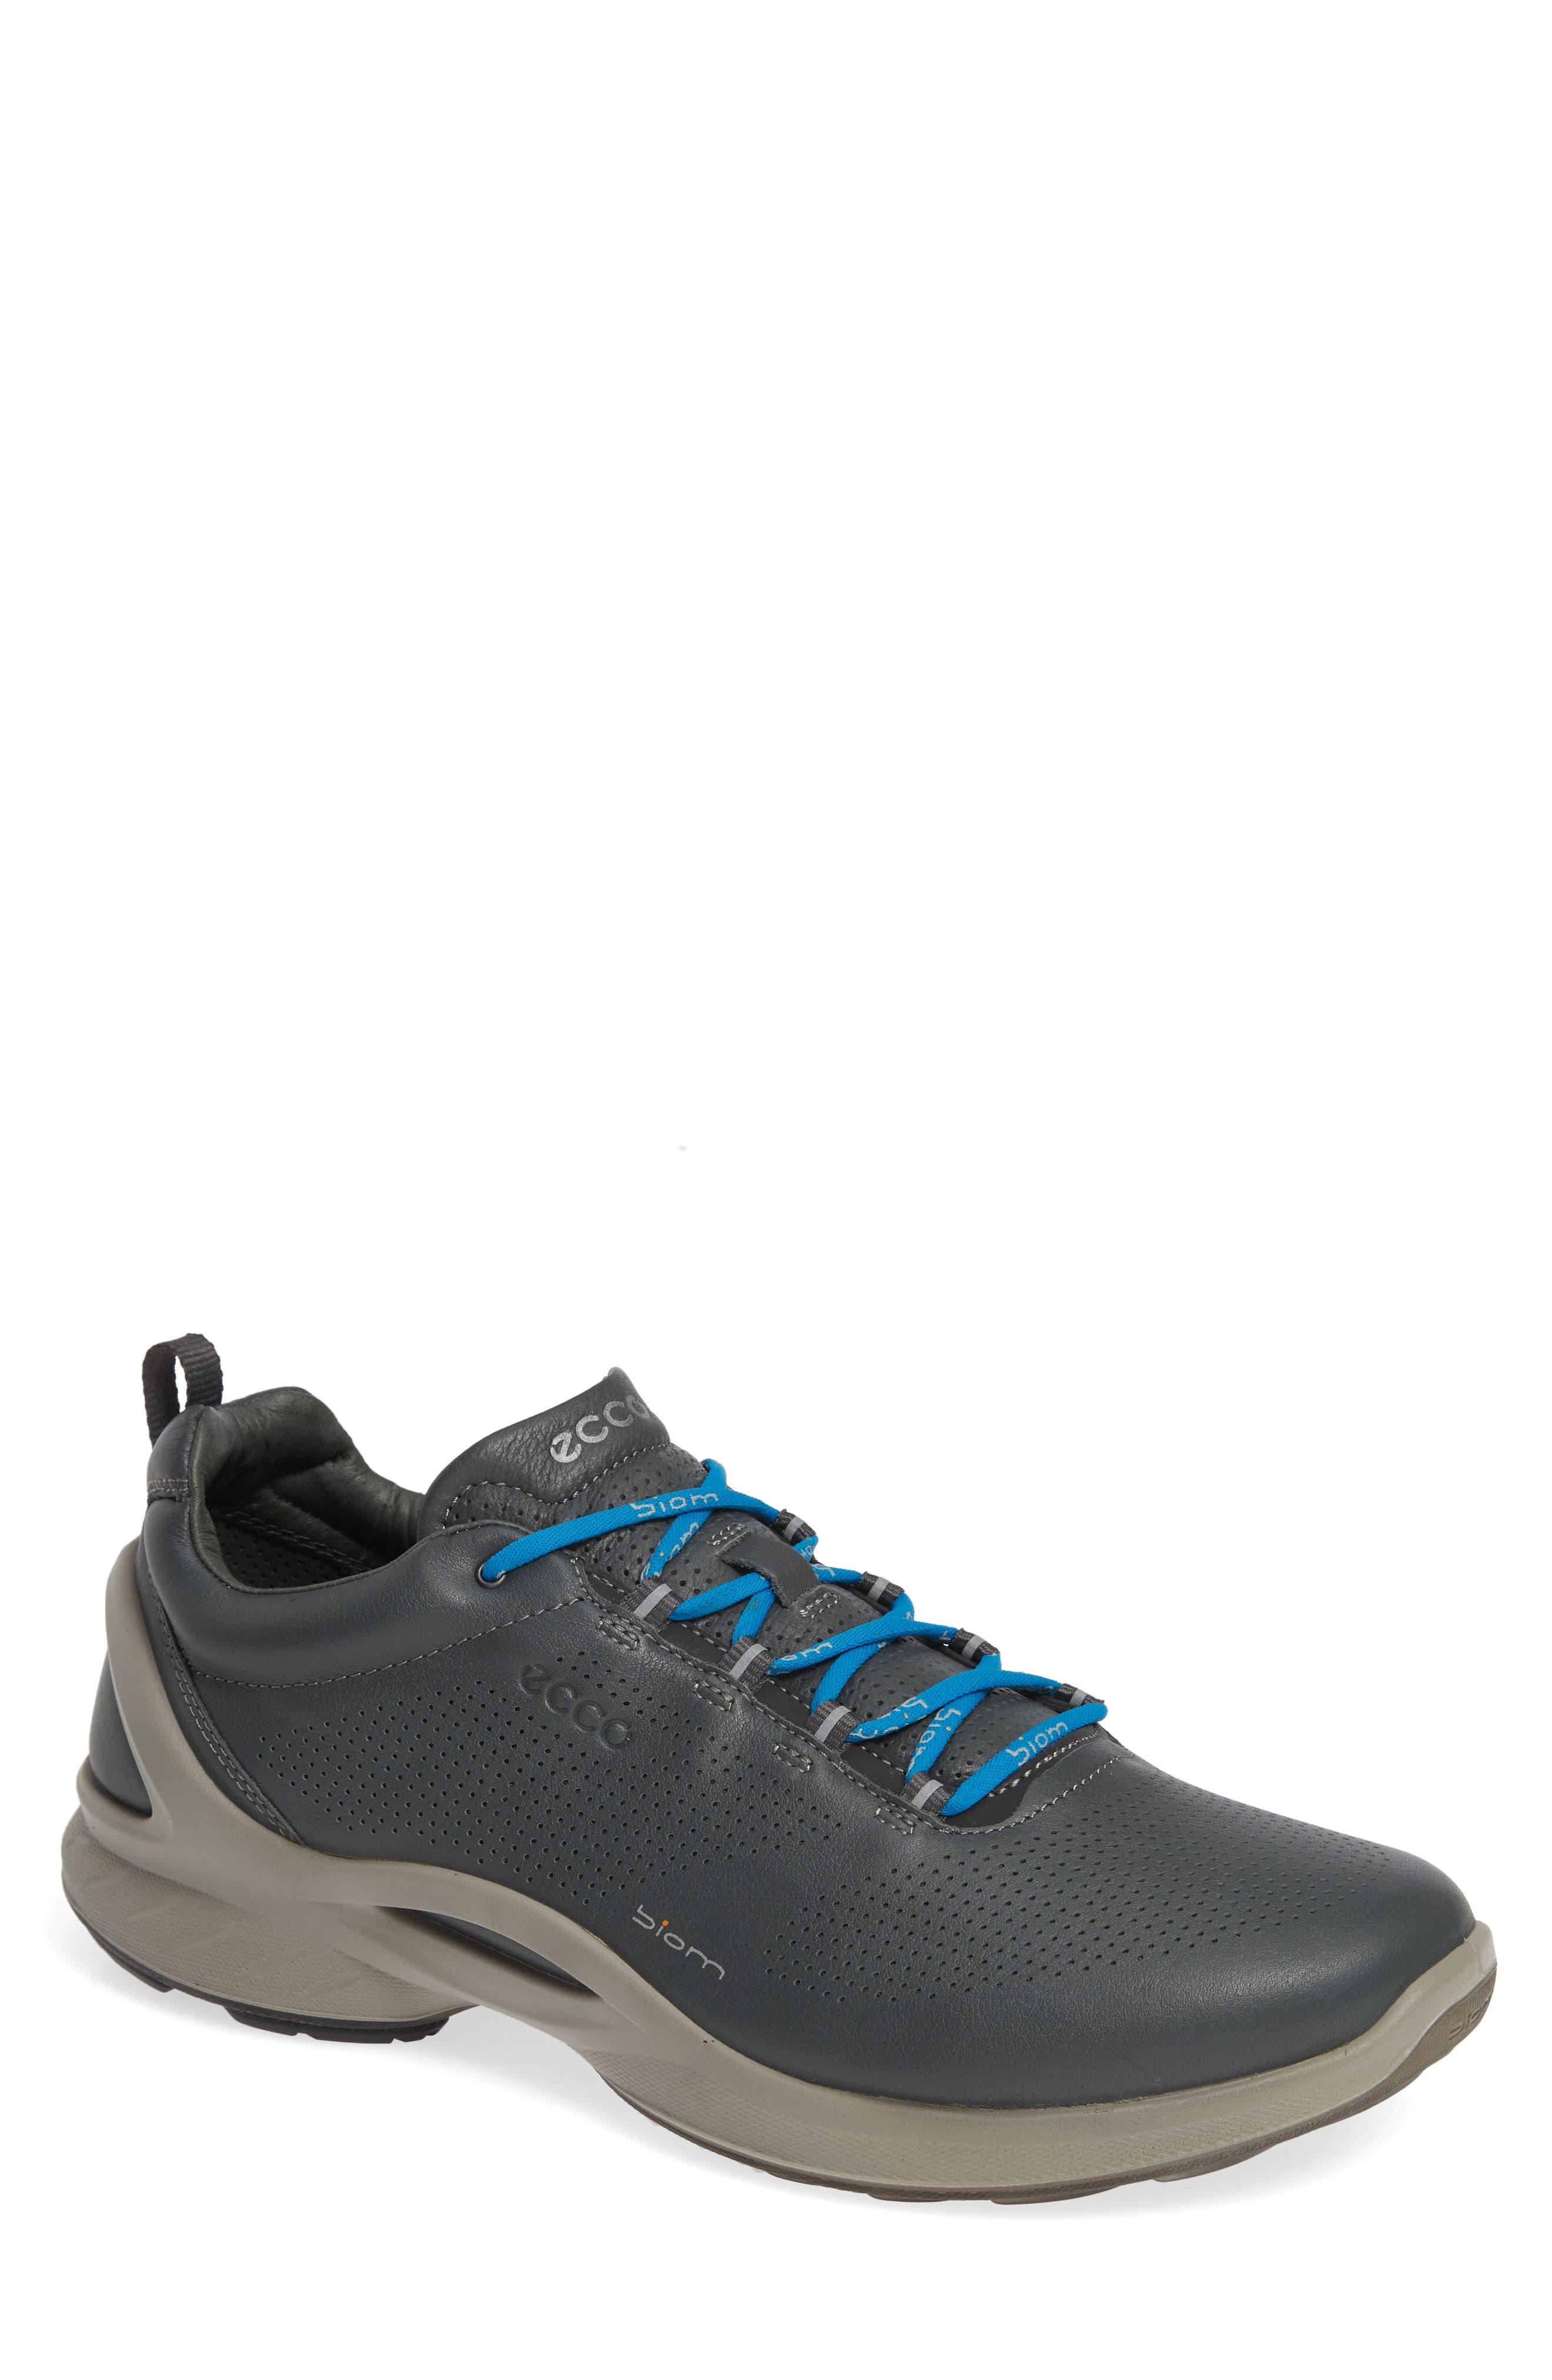 ECCO, 'BIOM Fjuel' Sneaker, Main thumbnail 1, color, DARK SHADOW LEATHER